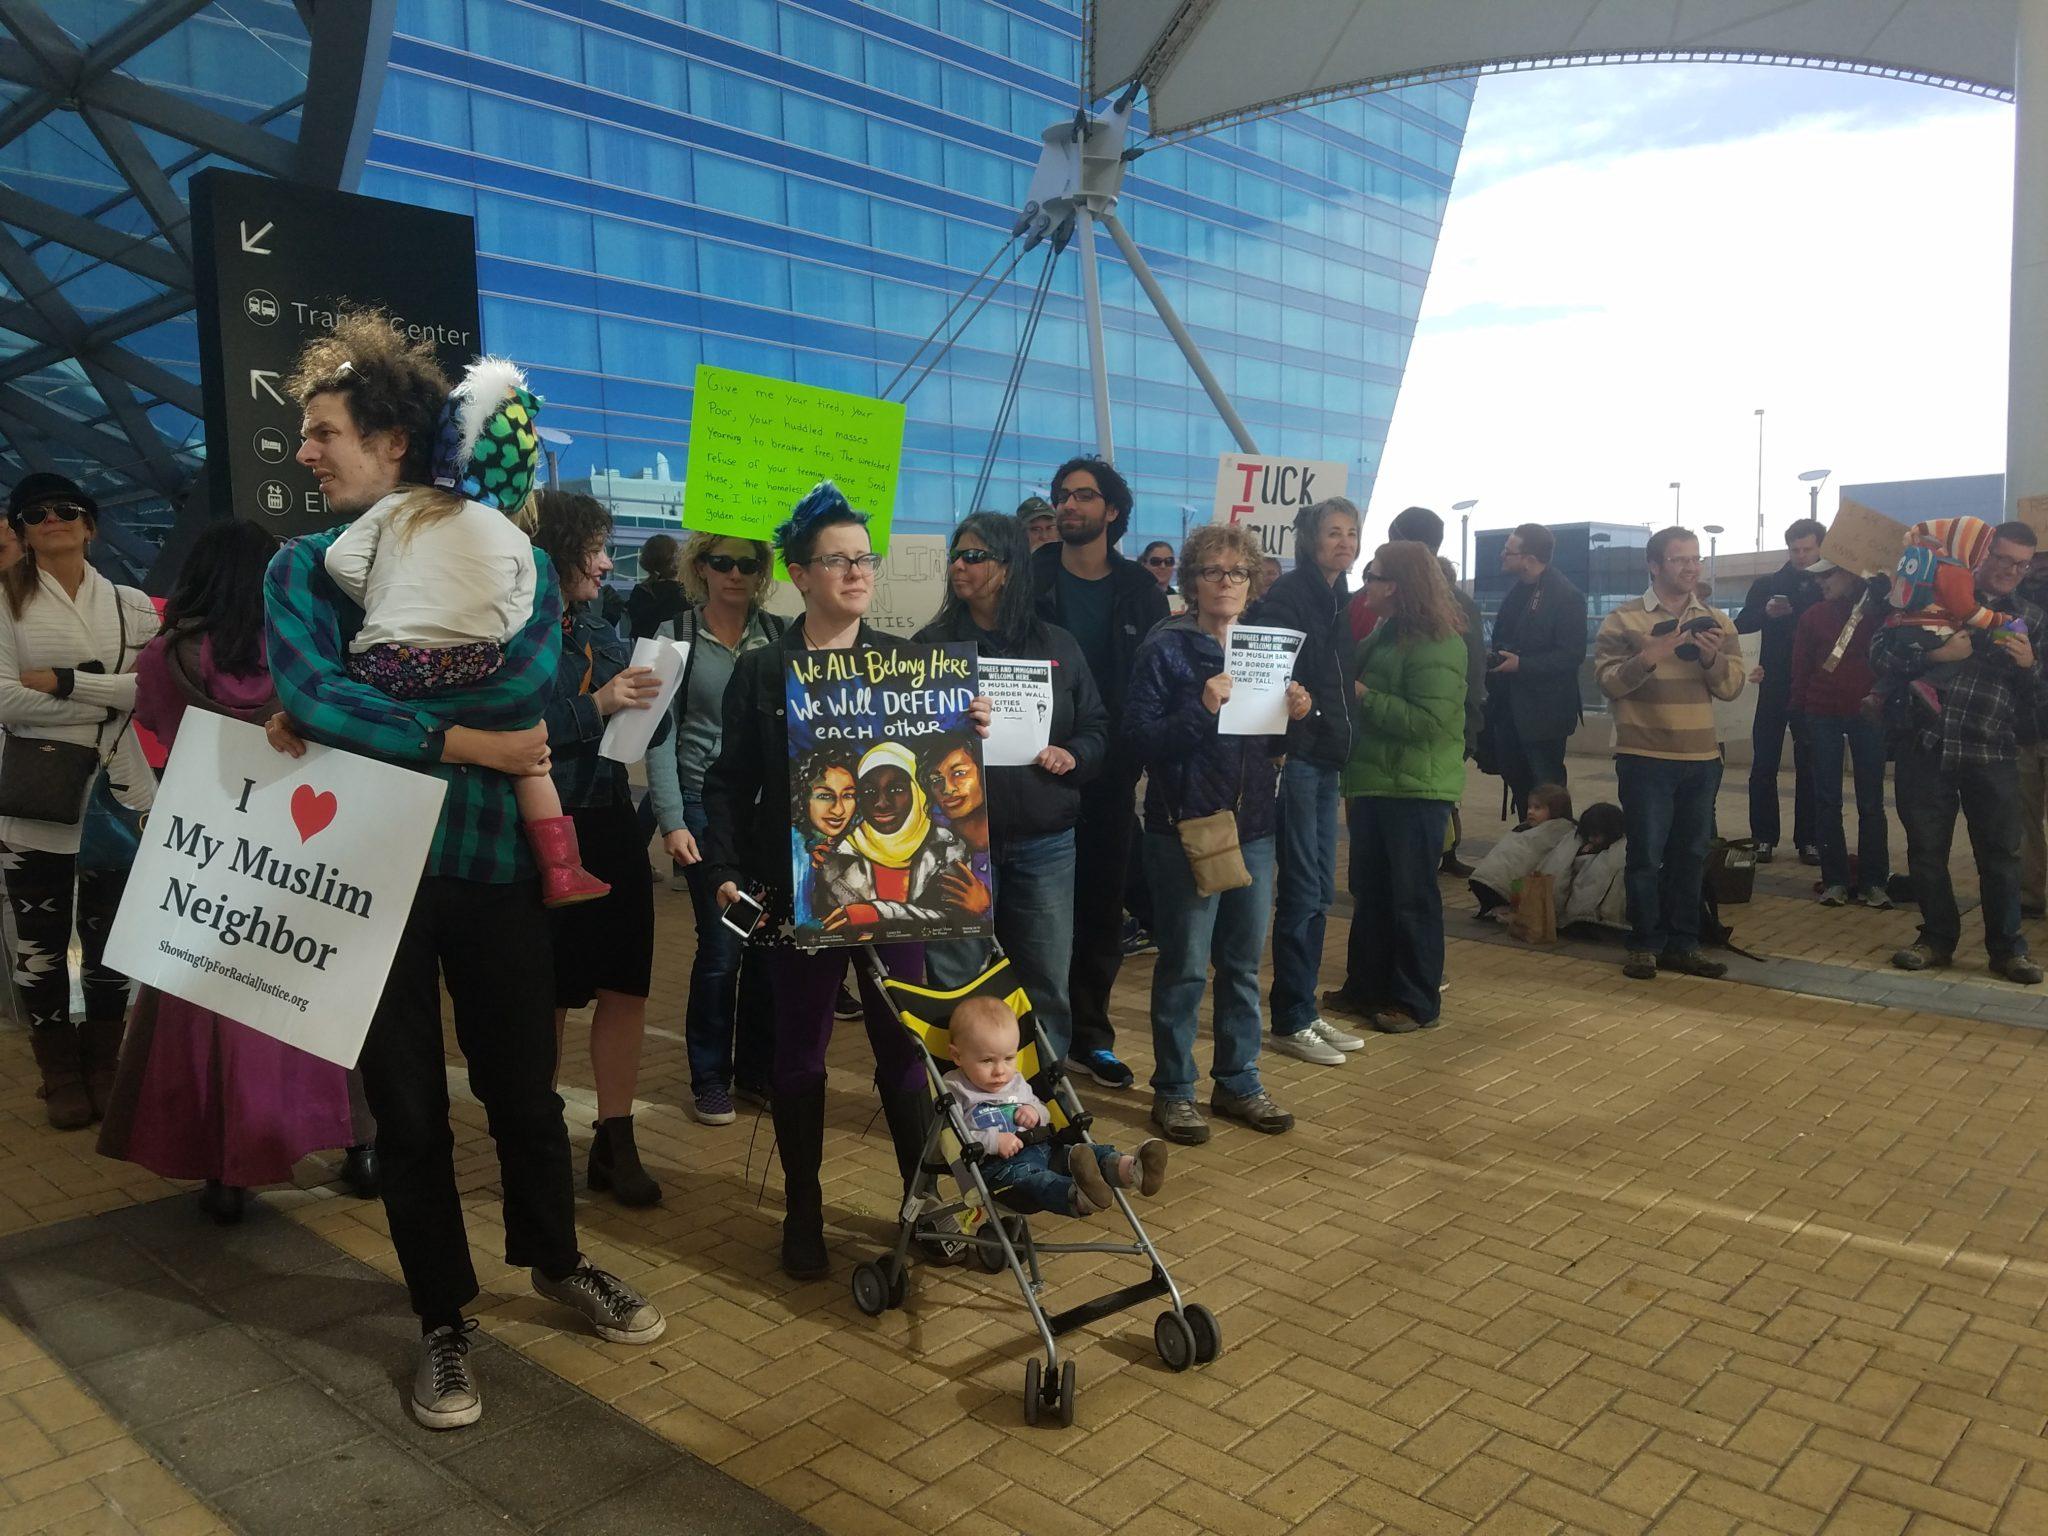 Protestors against Trump's refugee ban outside of Denver International Airport on Jan. 29, 2017.